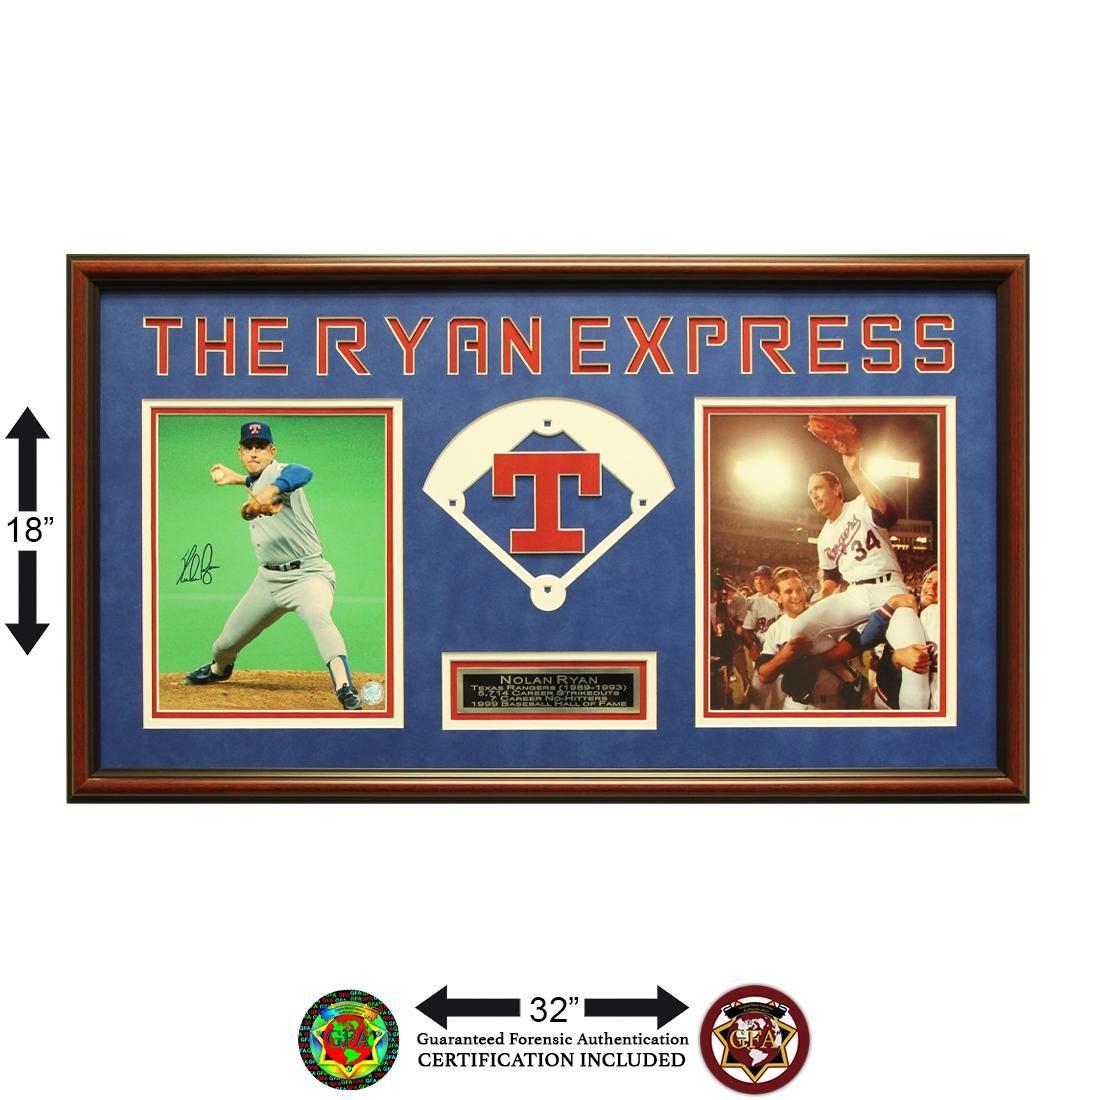 Nolan Ryan Texas Rangers 20x16 Framed signed GFA